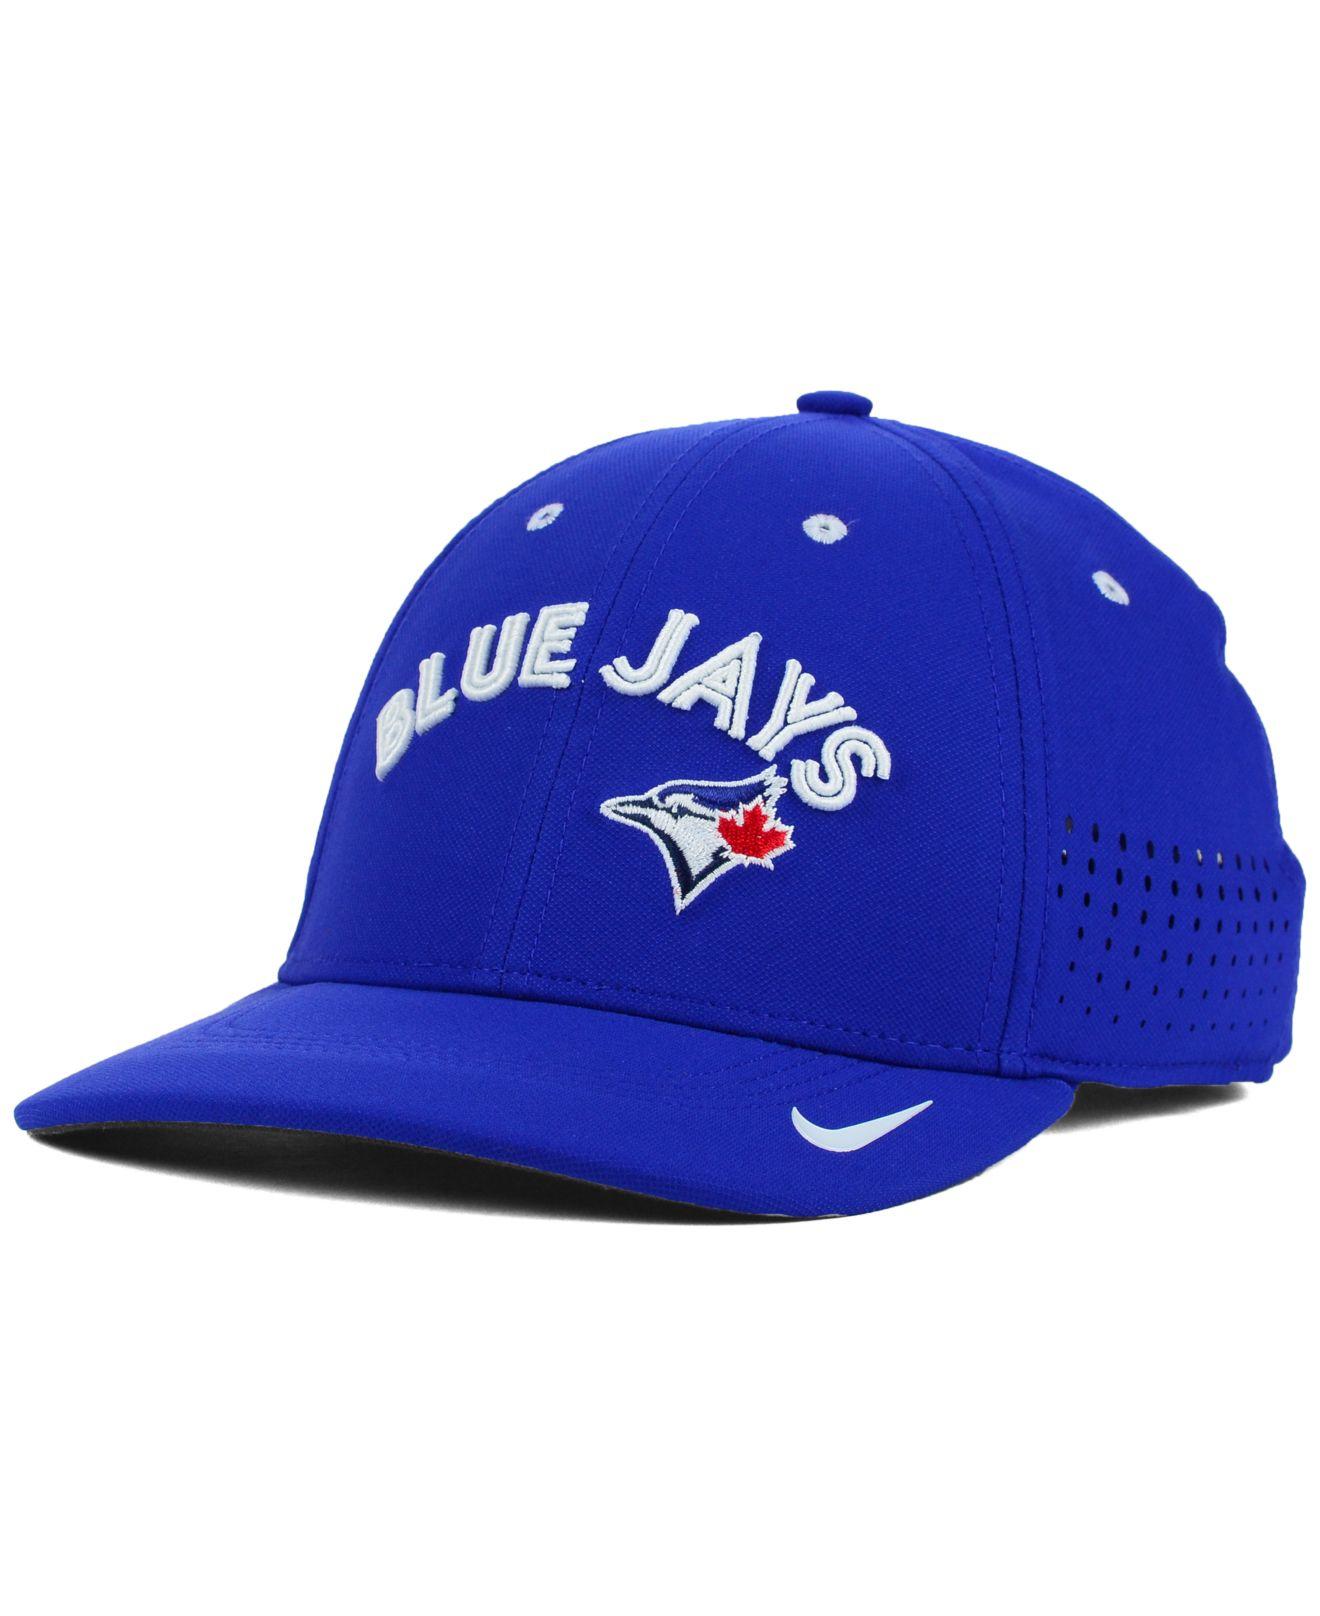 save off ff323 14ad5 ... order lyst nike toronto blue jays vapor swoosh flex cap in blue for men  3c822 ae846